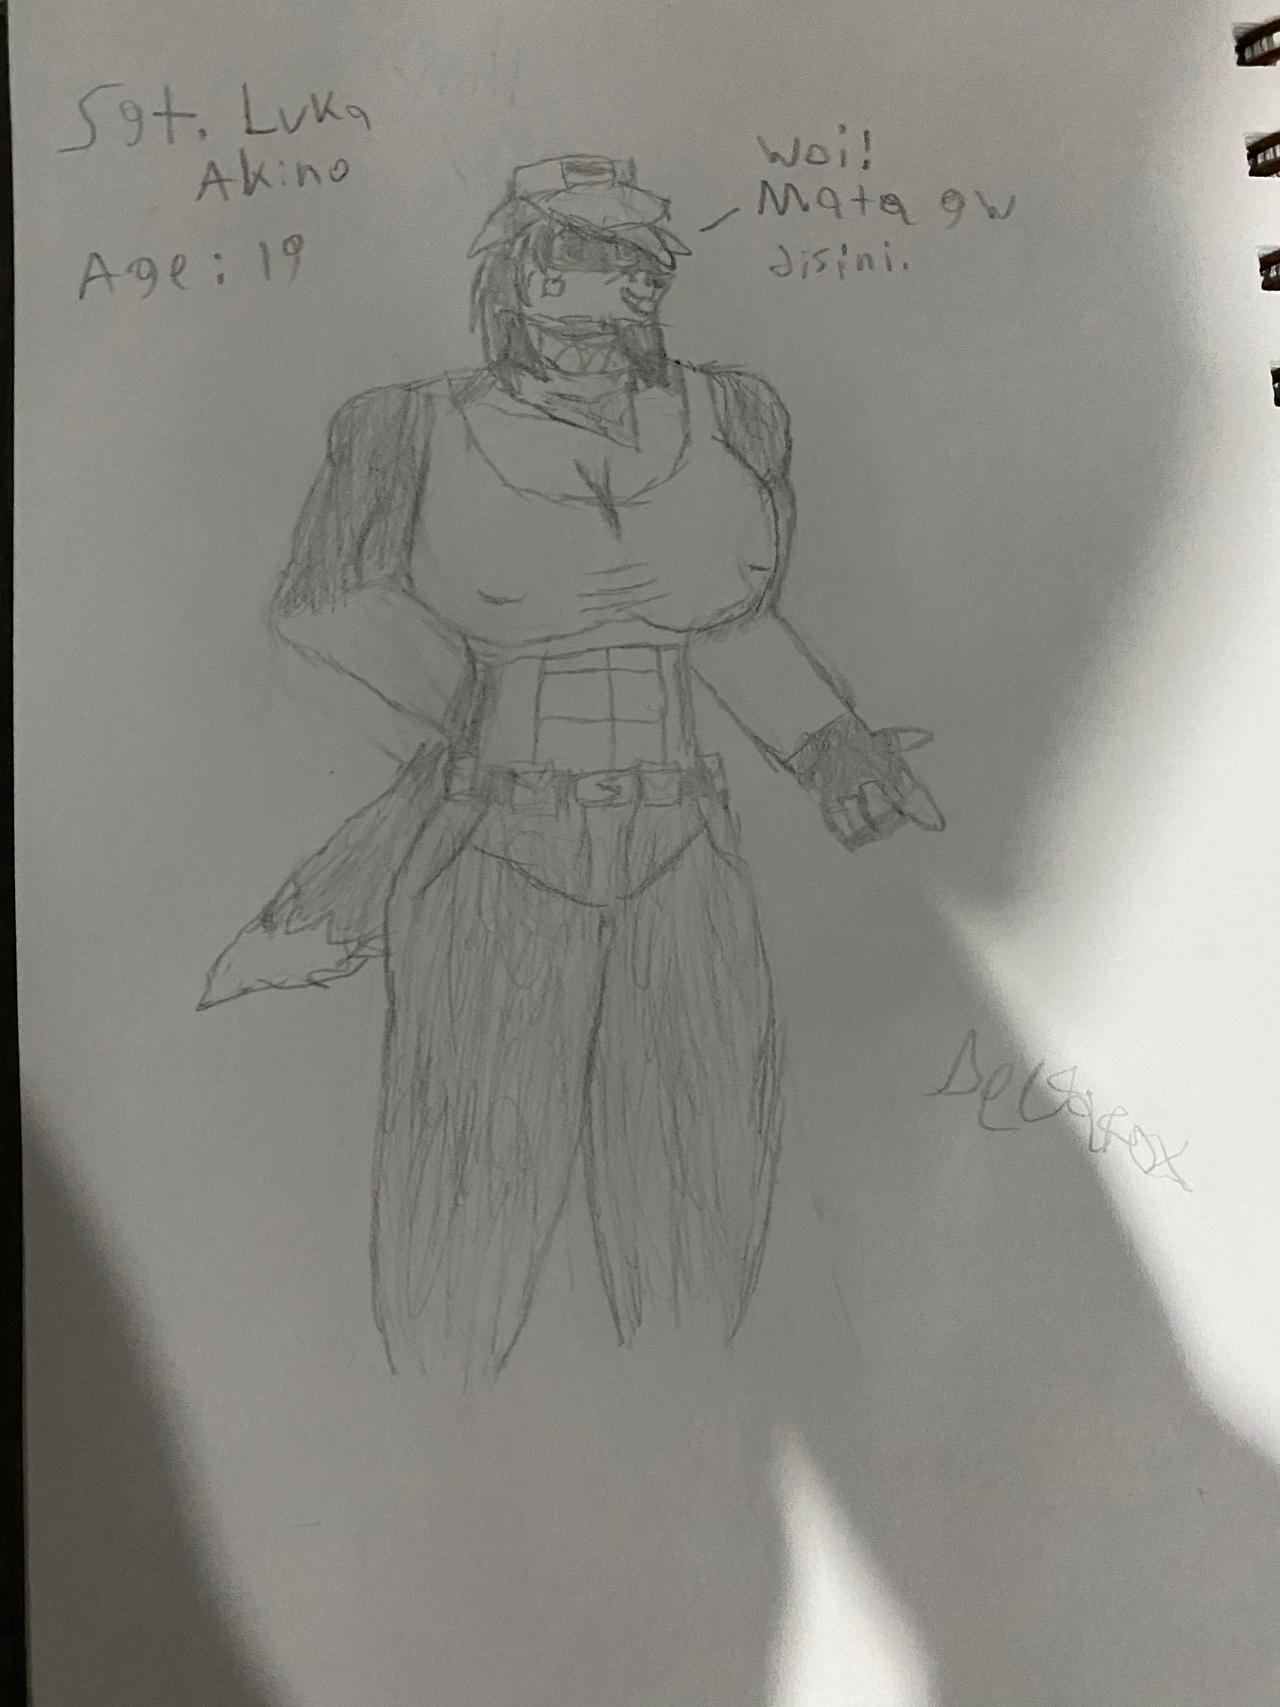 Sgt. Luka Akino